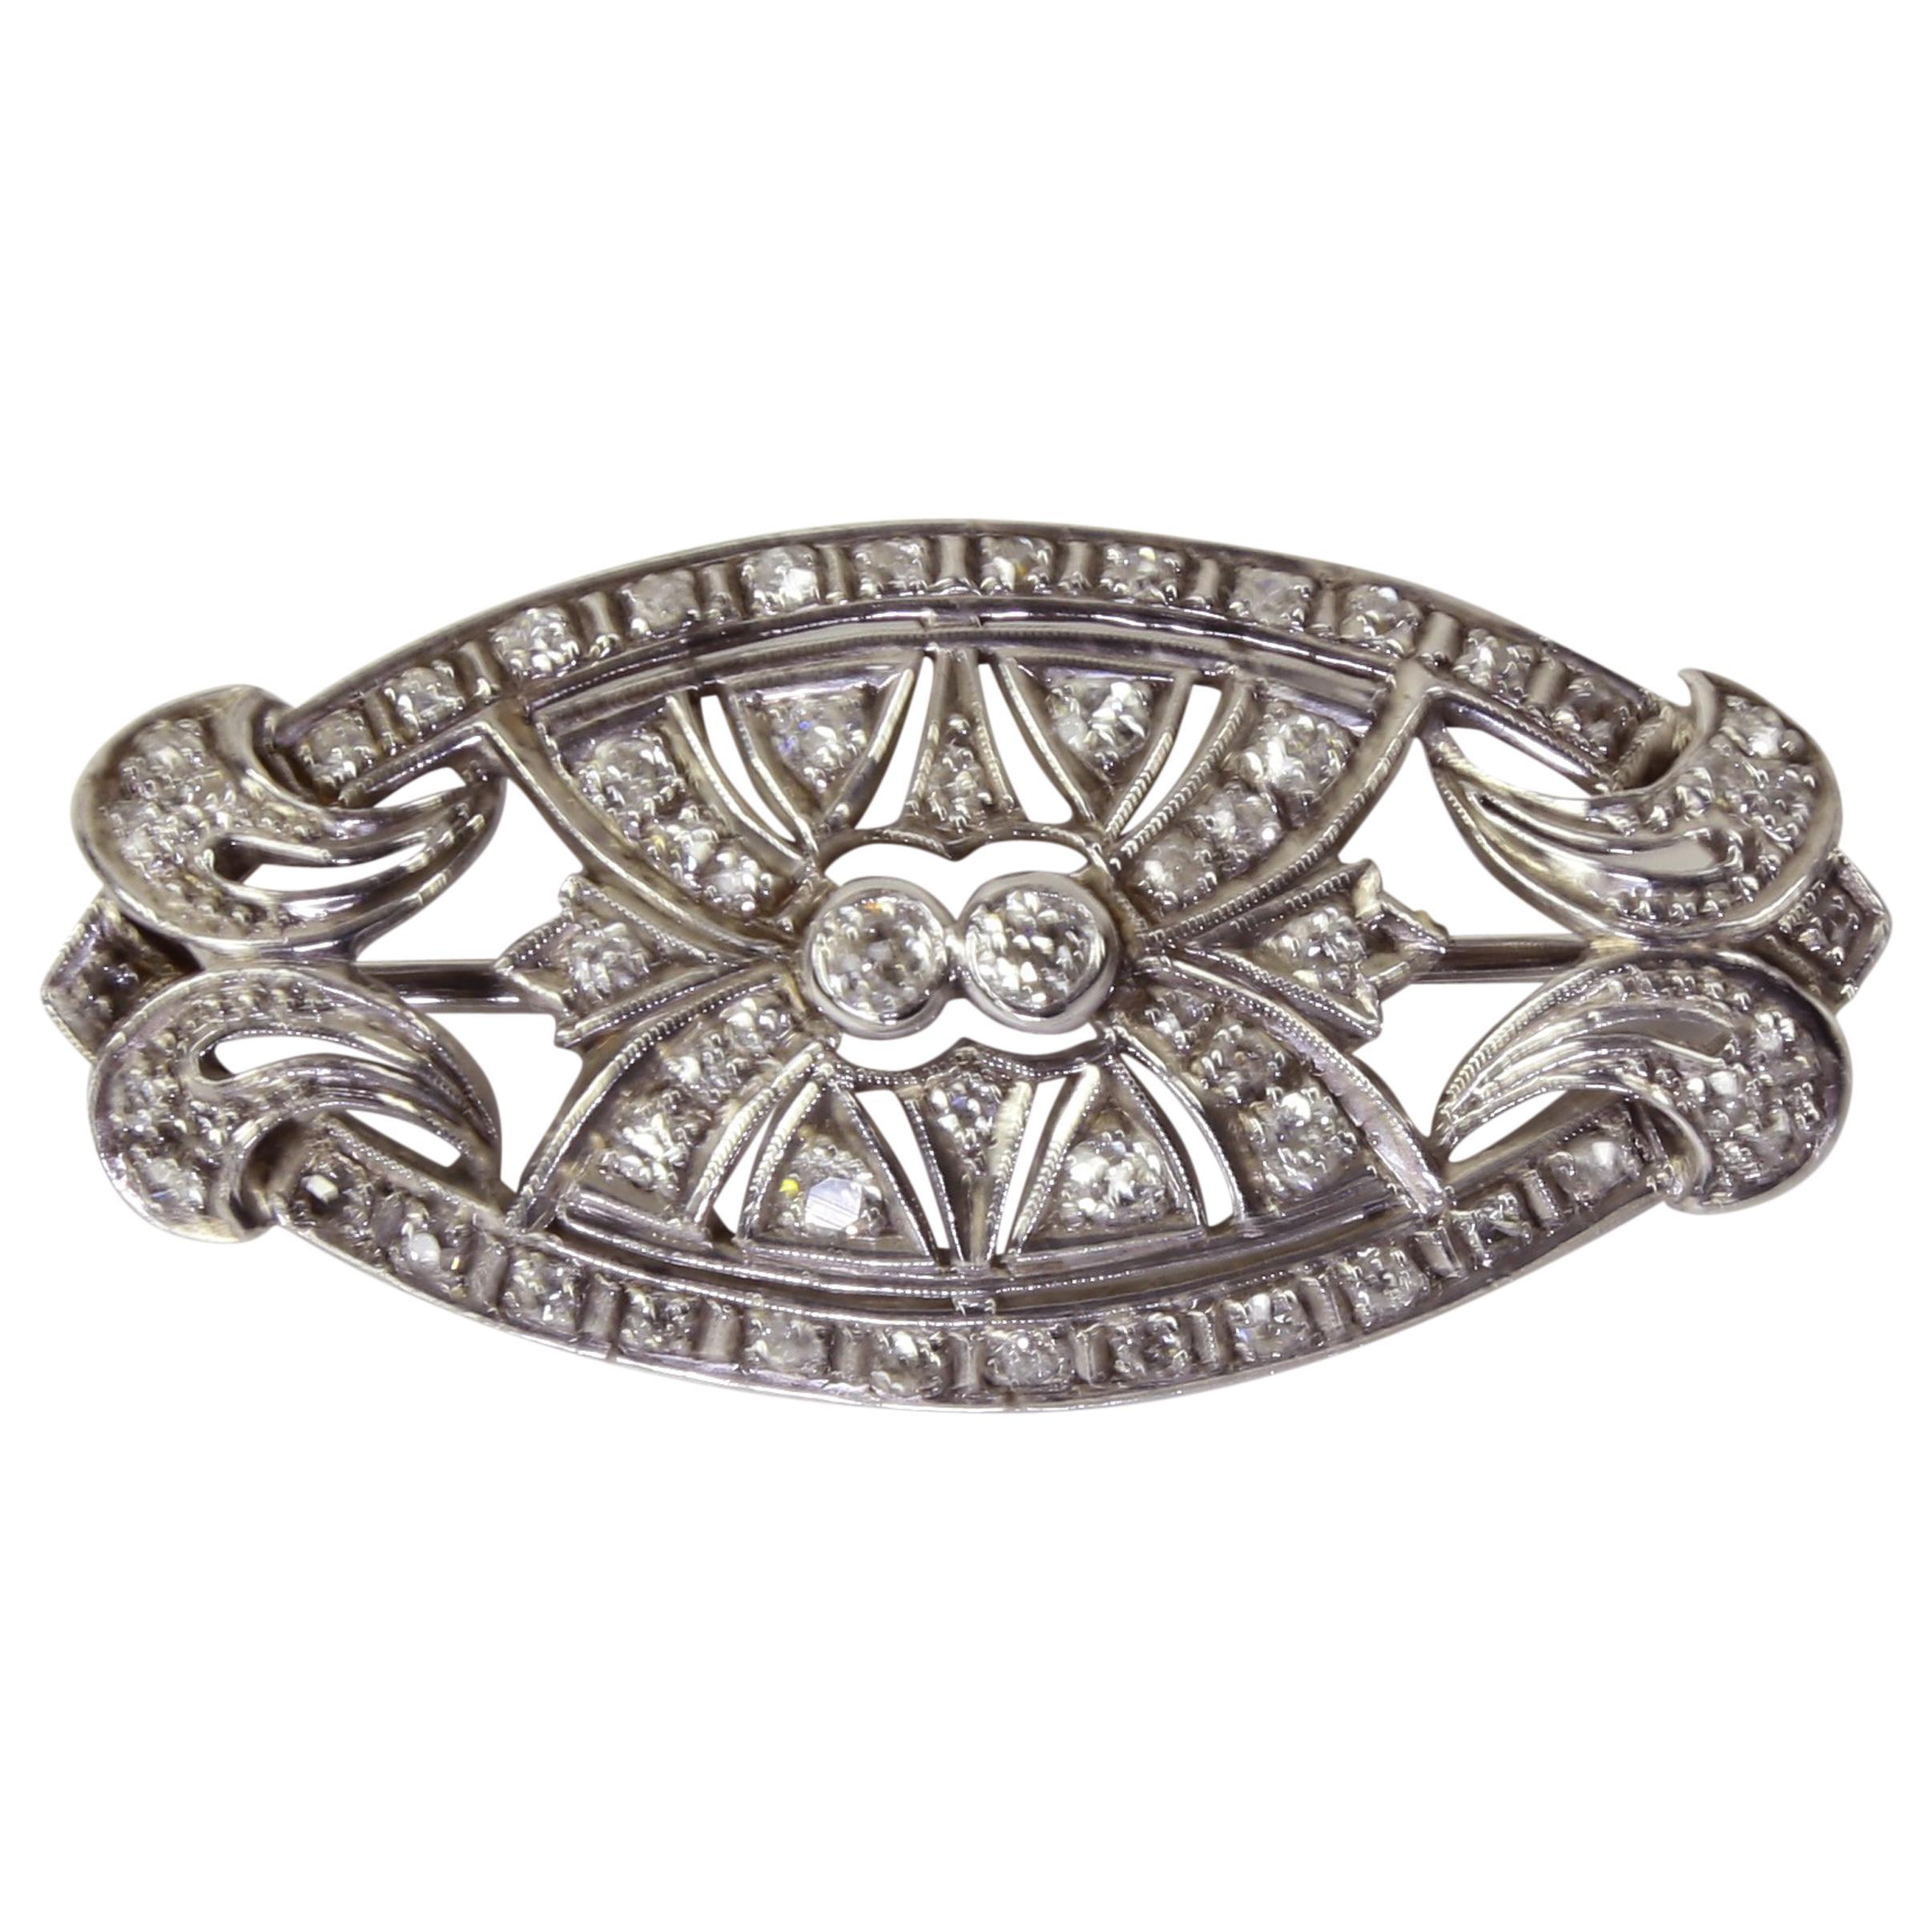 Antique Edwardian Diamond Platinum Pendant Brooch Pin Estate Fine Jewelry